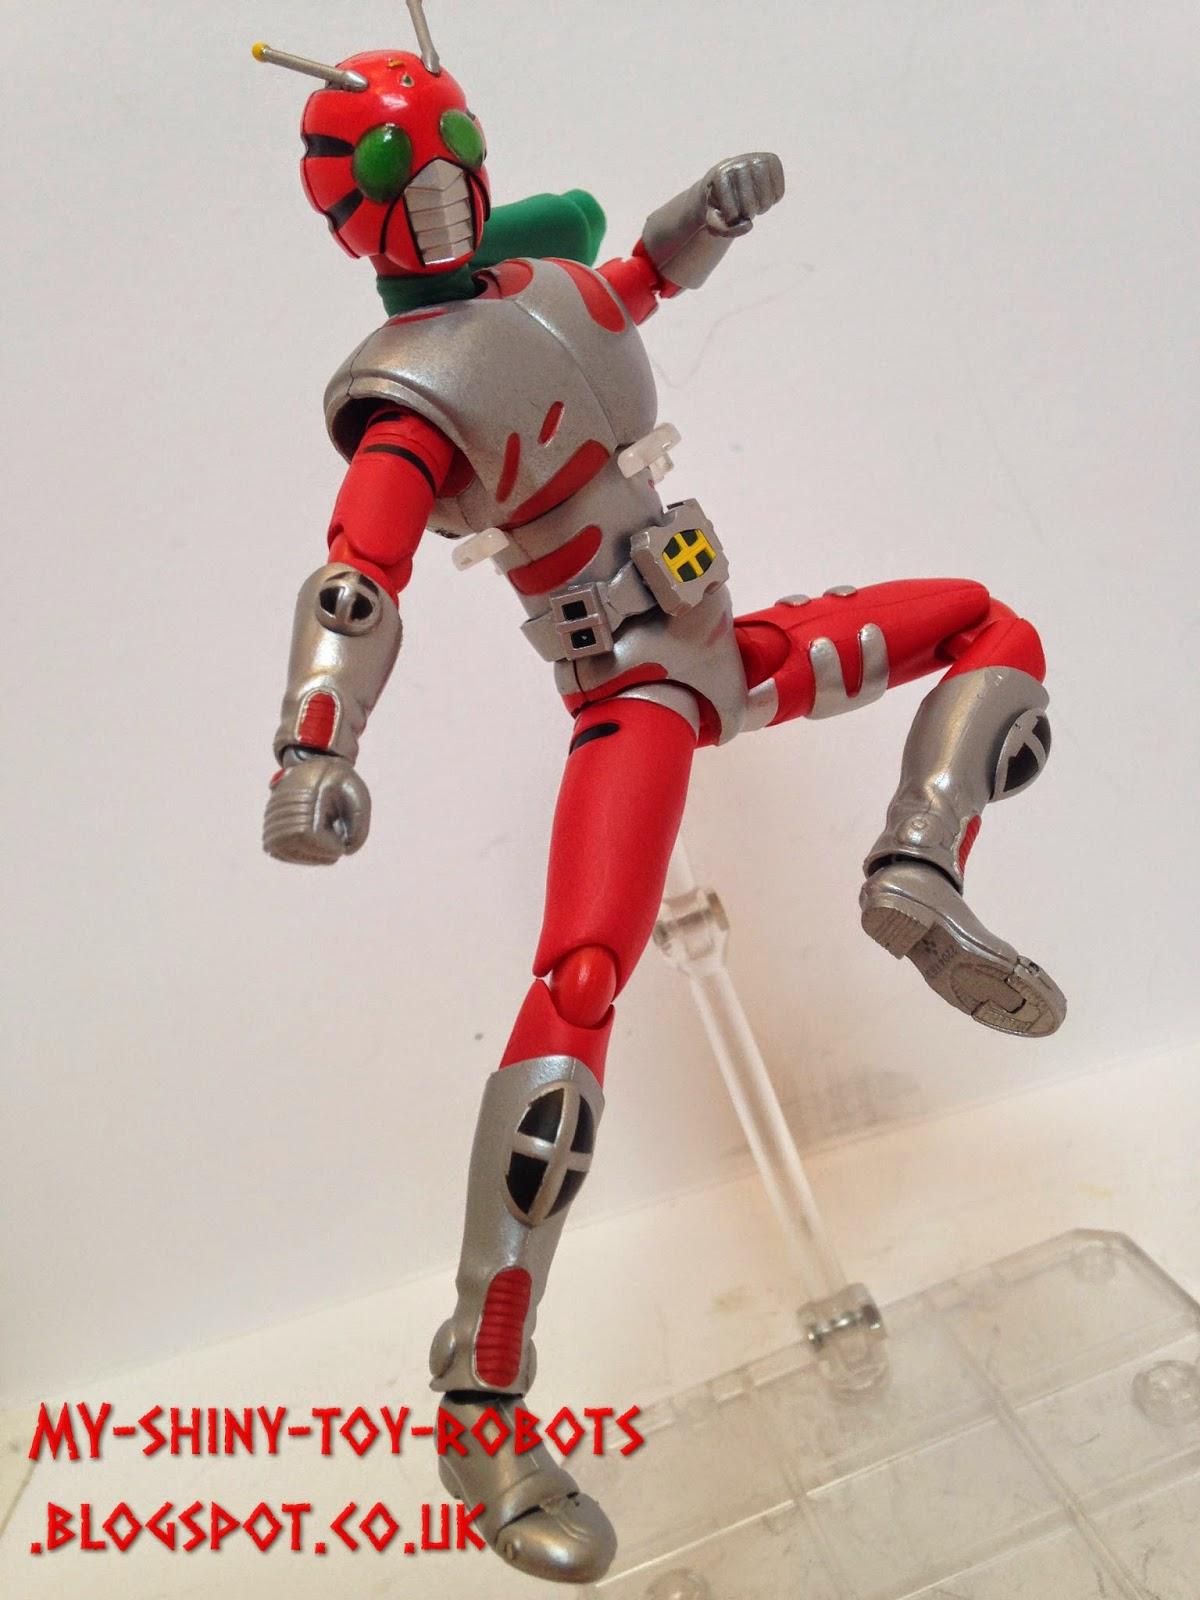 Obligatory rider kick!